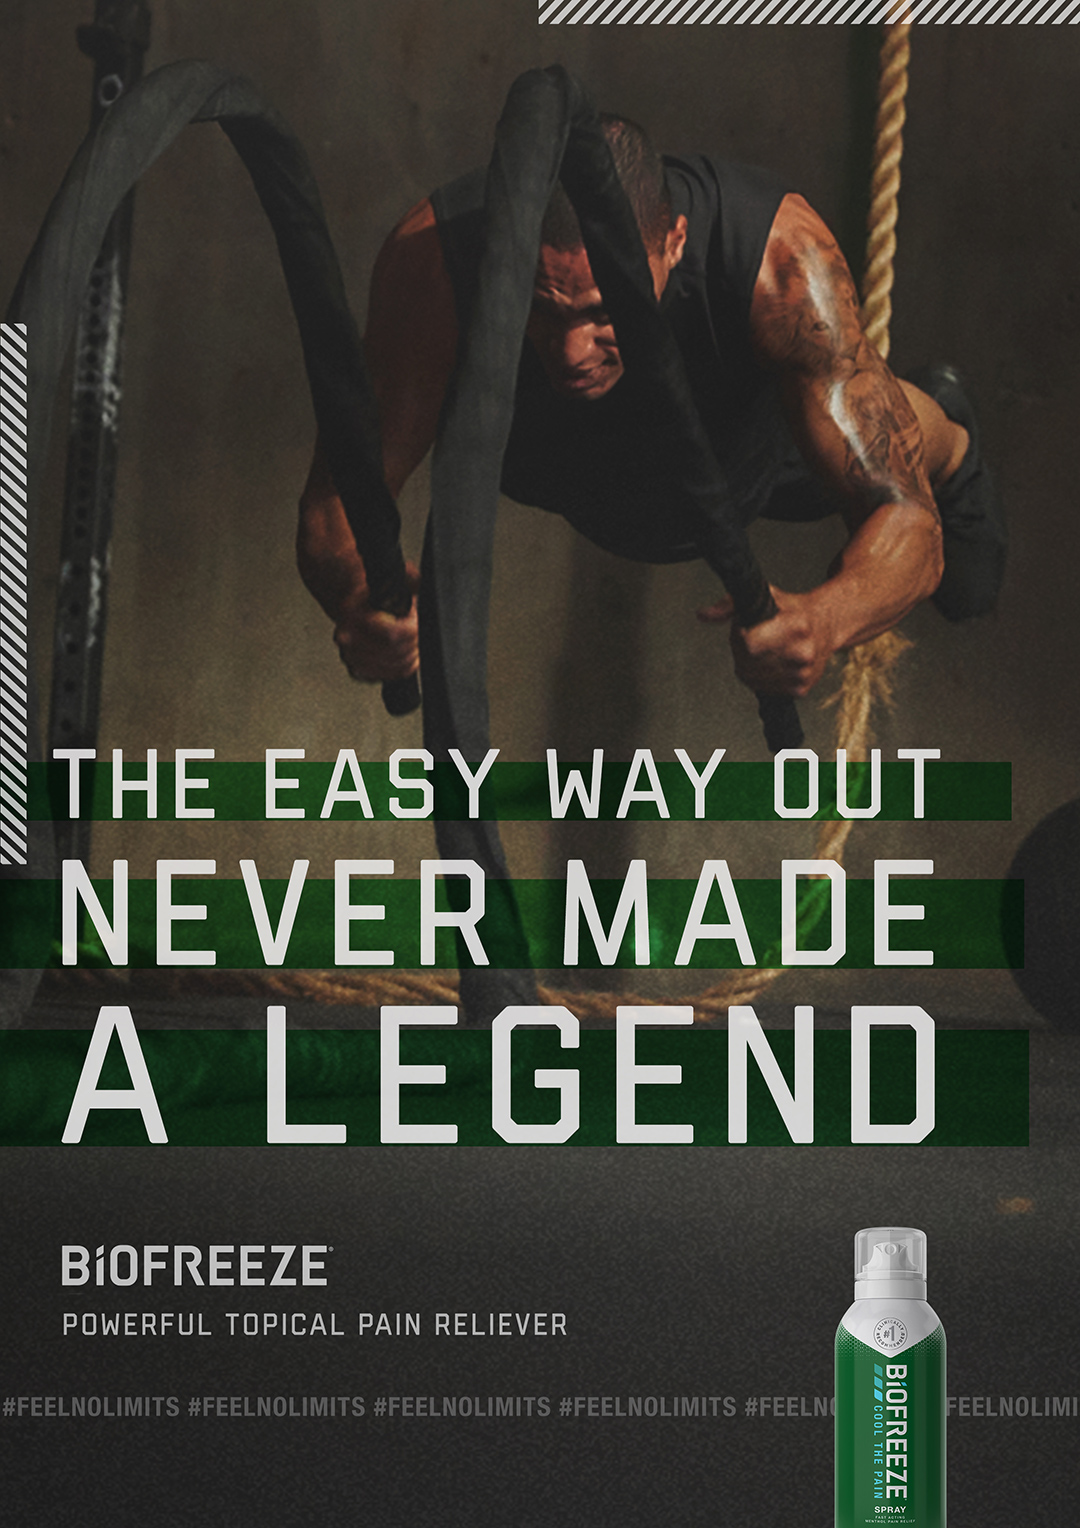 Biofreeze Limitless Campaign Print